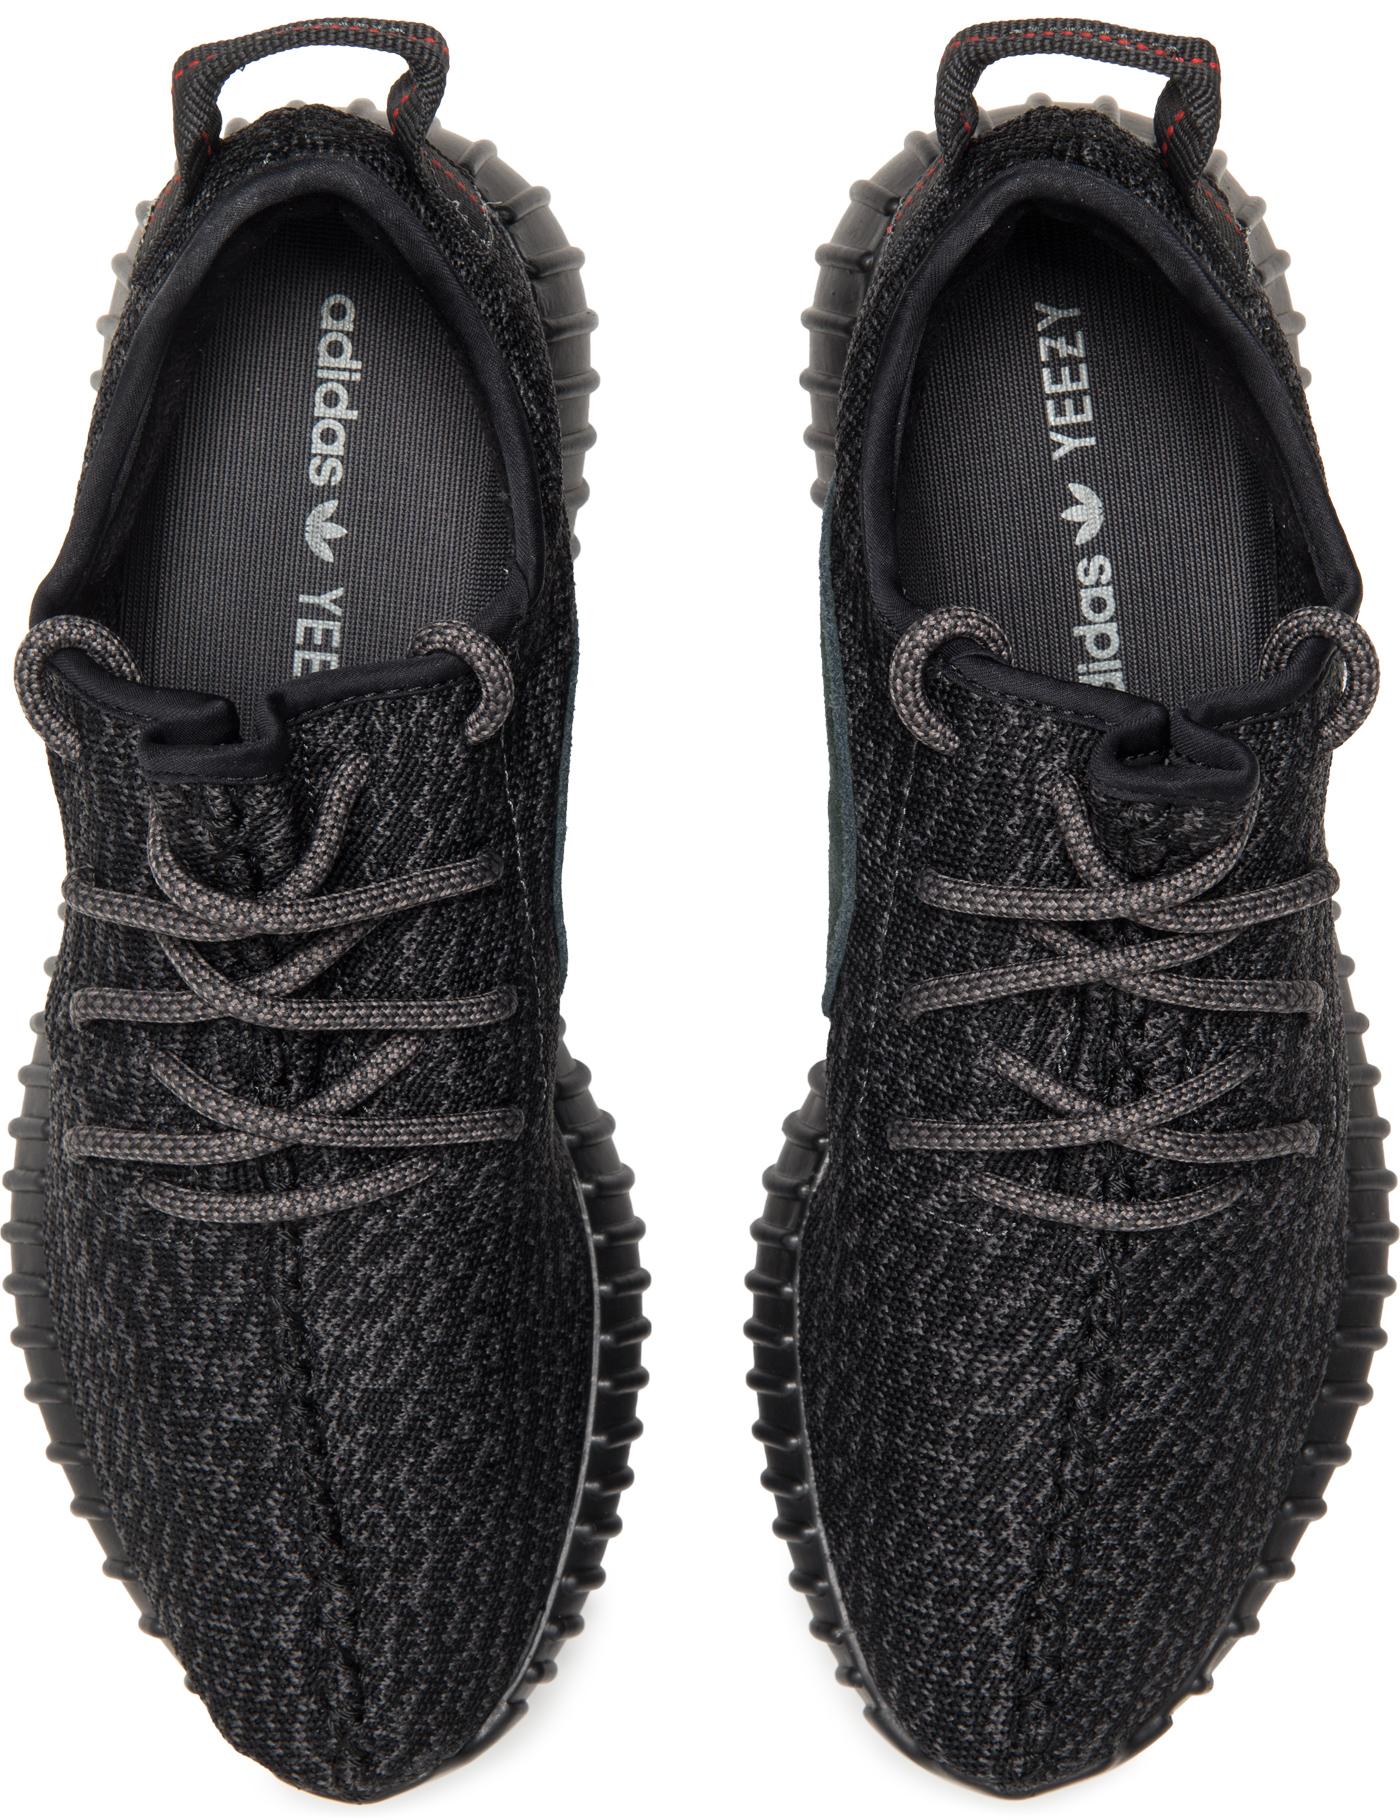 3c45bb41d6c3e adidas pakistan yeezy boost 350 pirate black size 12